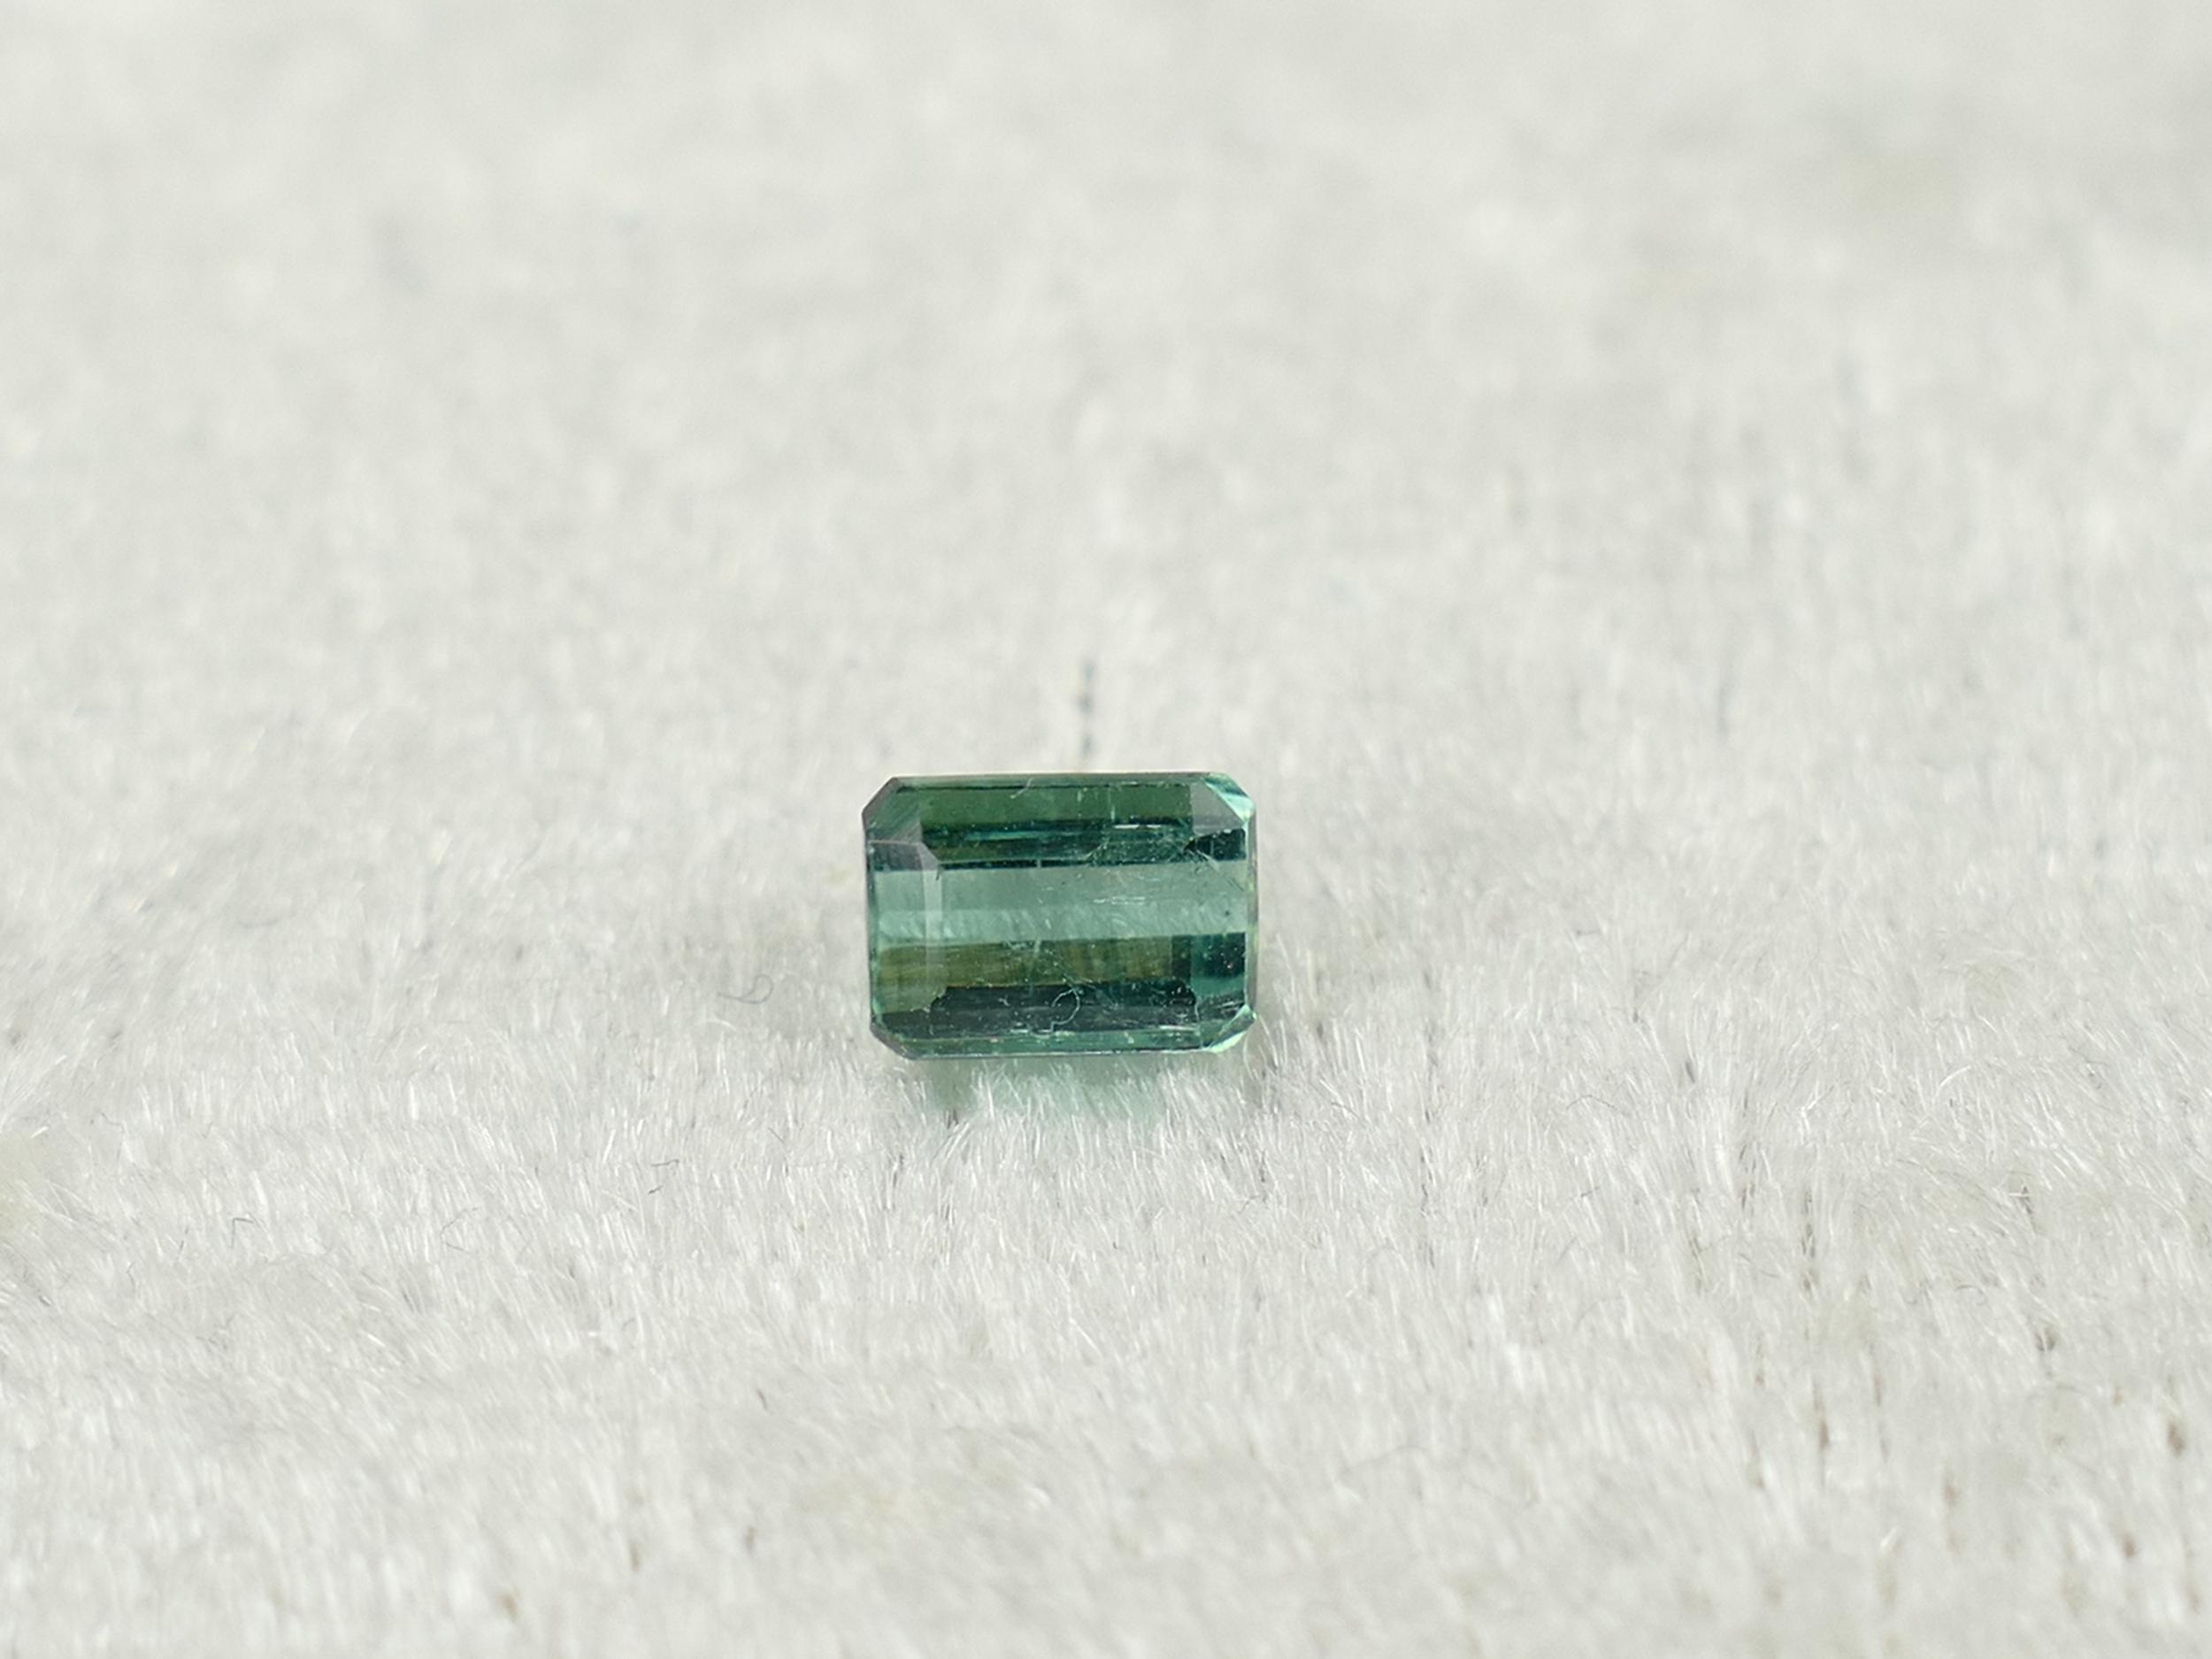 5.2x3.8mm Superbe Tourmaline naturelle bleu vert 0.61ct Afghanistan taille octogonale (#PK514)